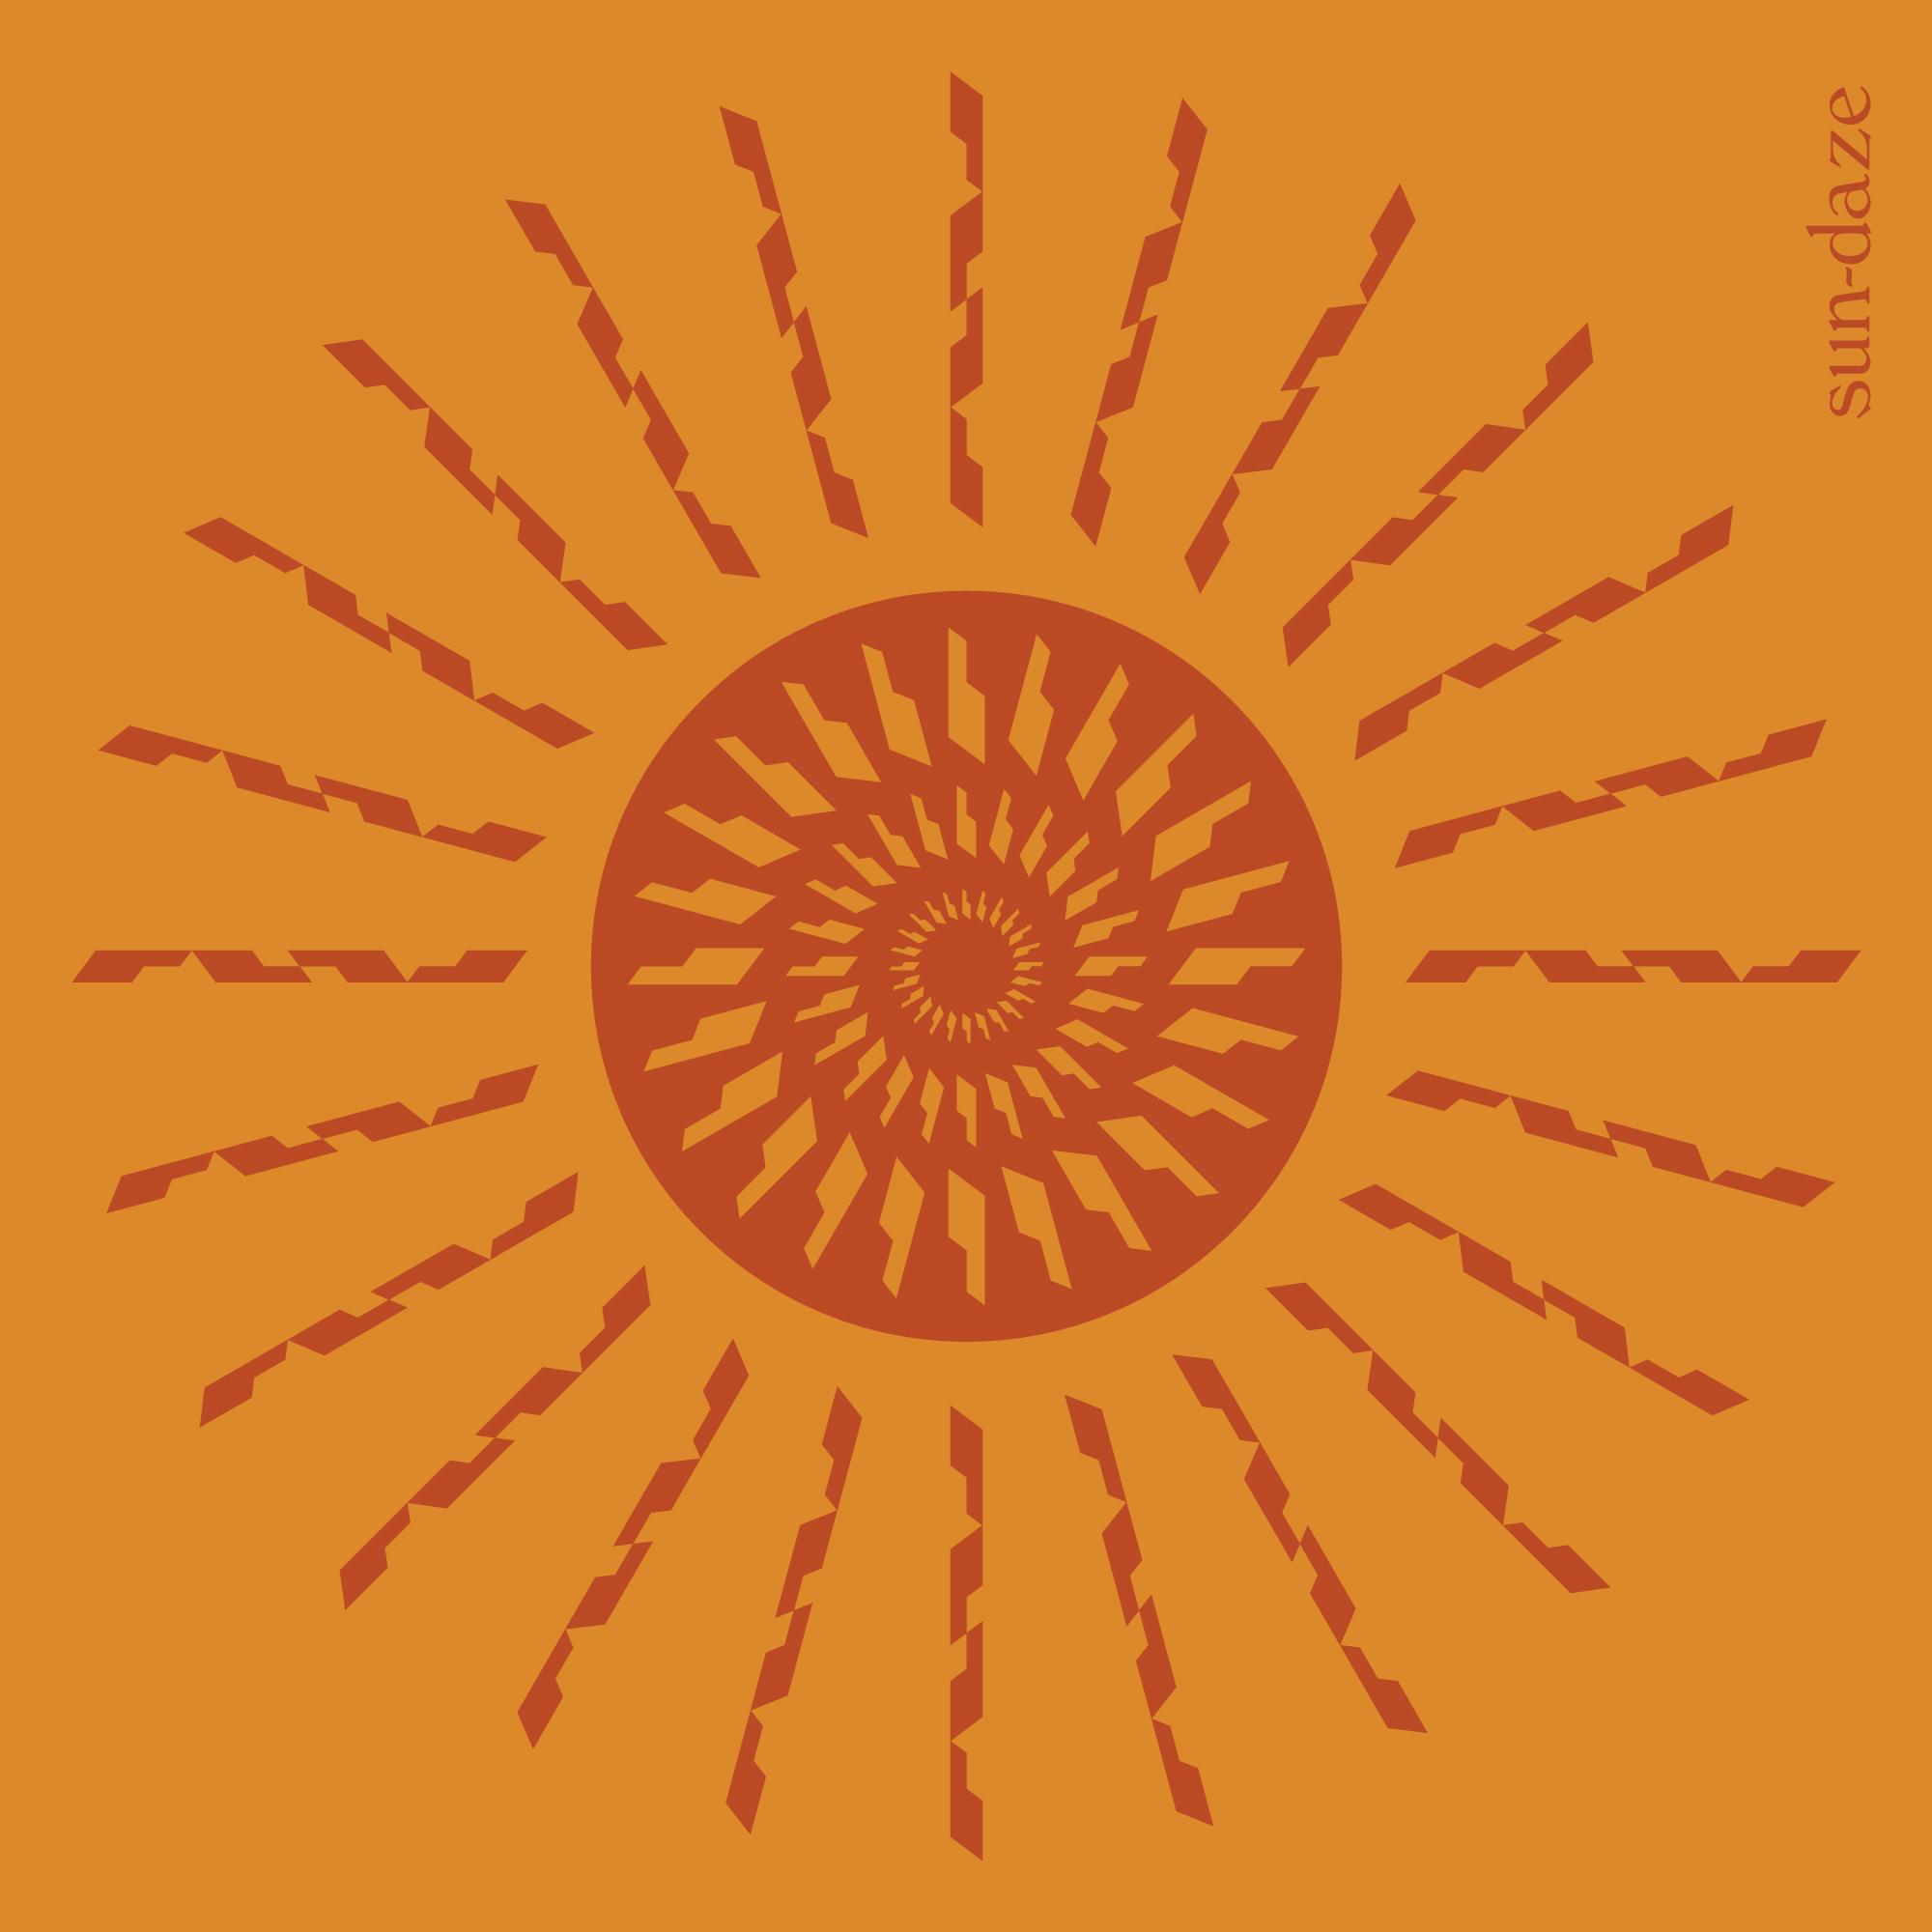 sunproject_11